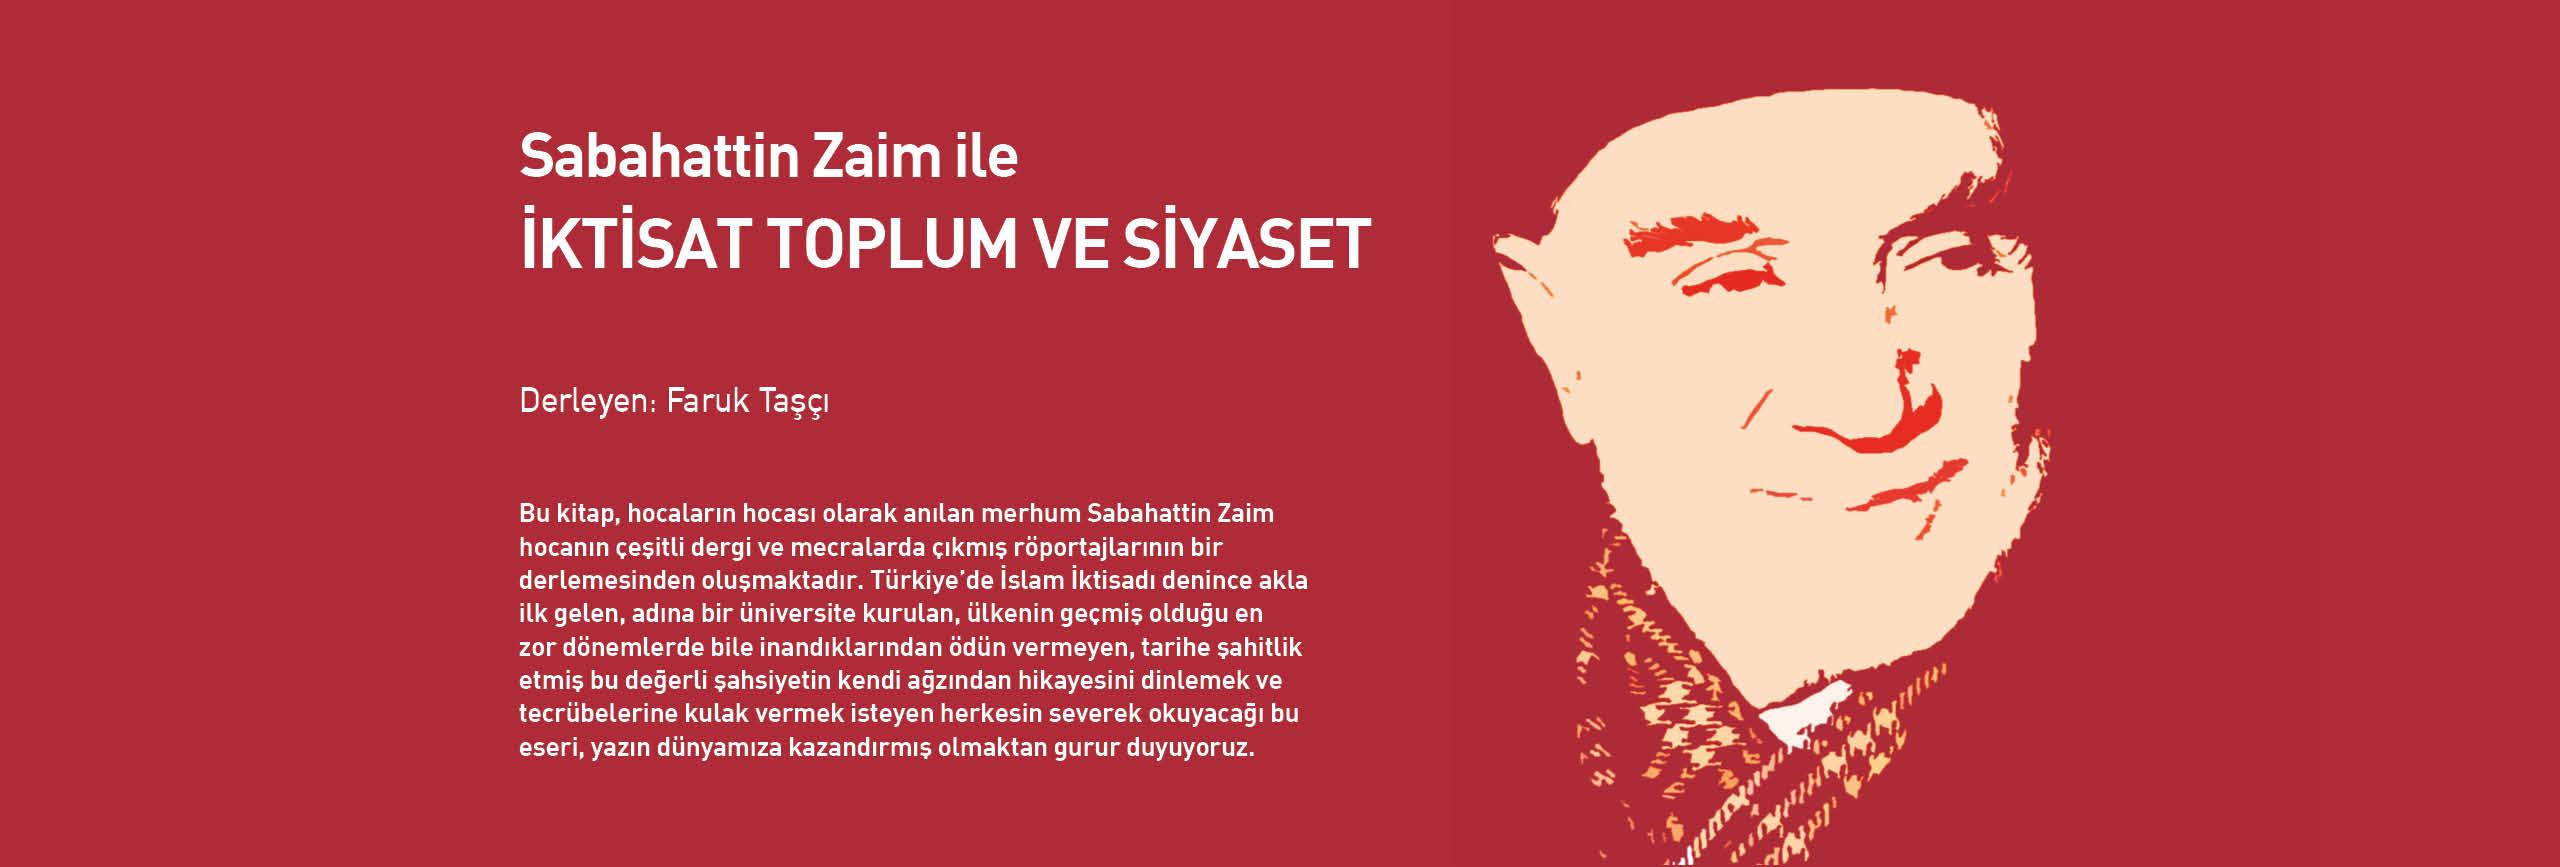 http://www.iktisatyayinlari.com/content/1-home/1.jpg